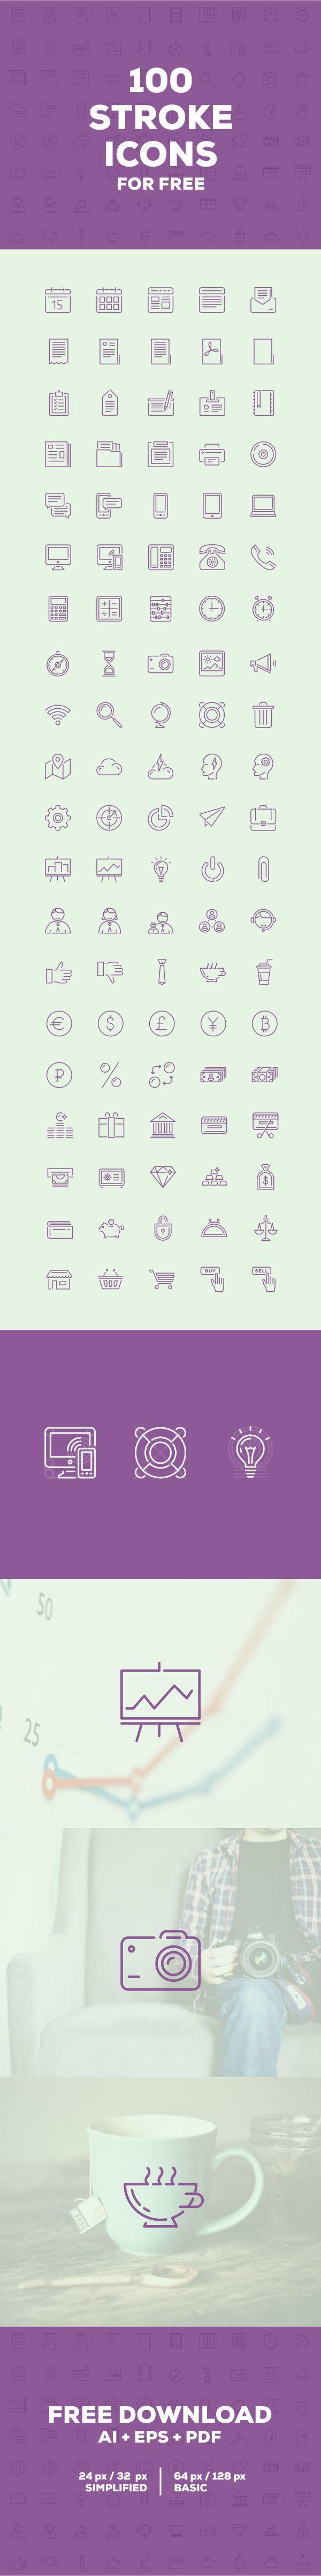 100 free icons on Behance